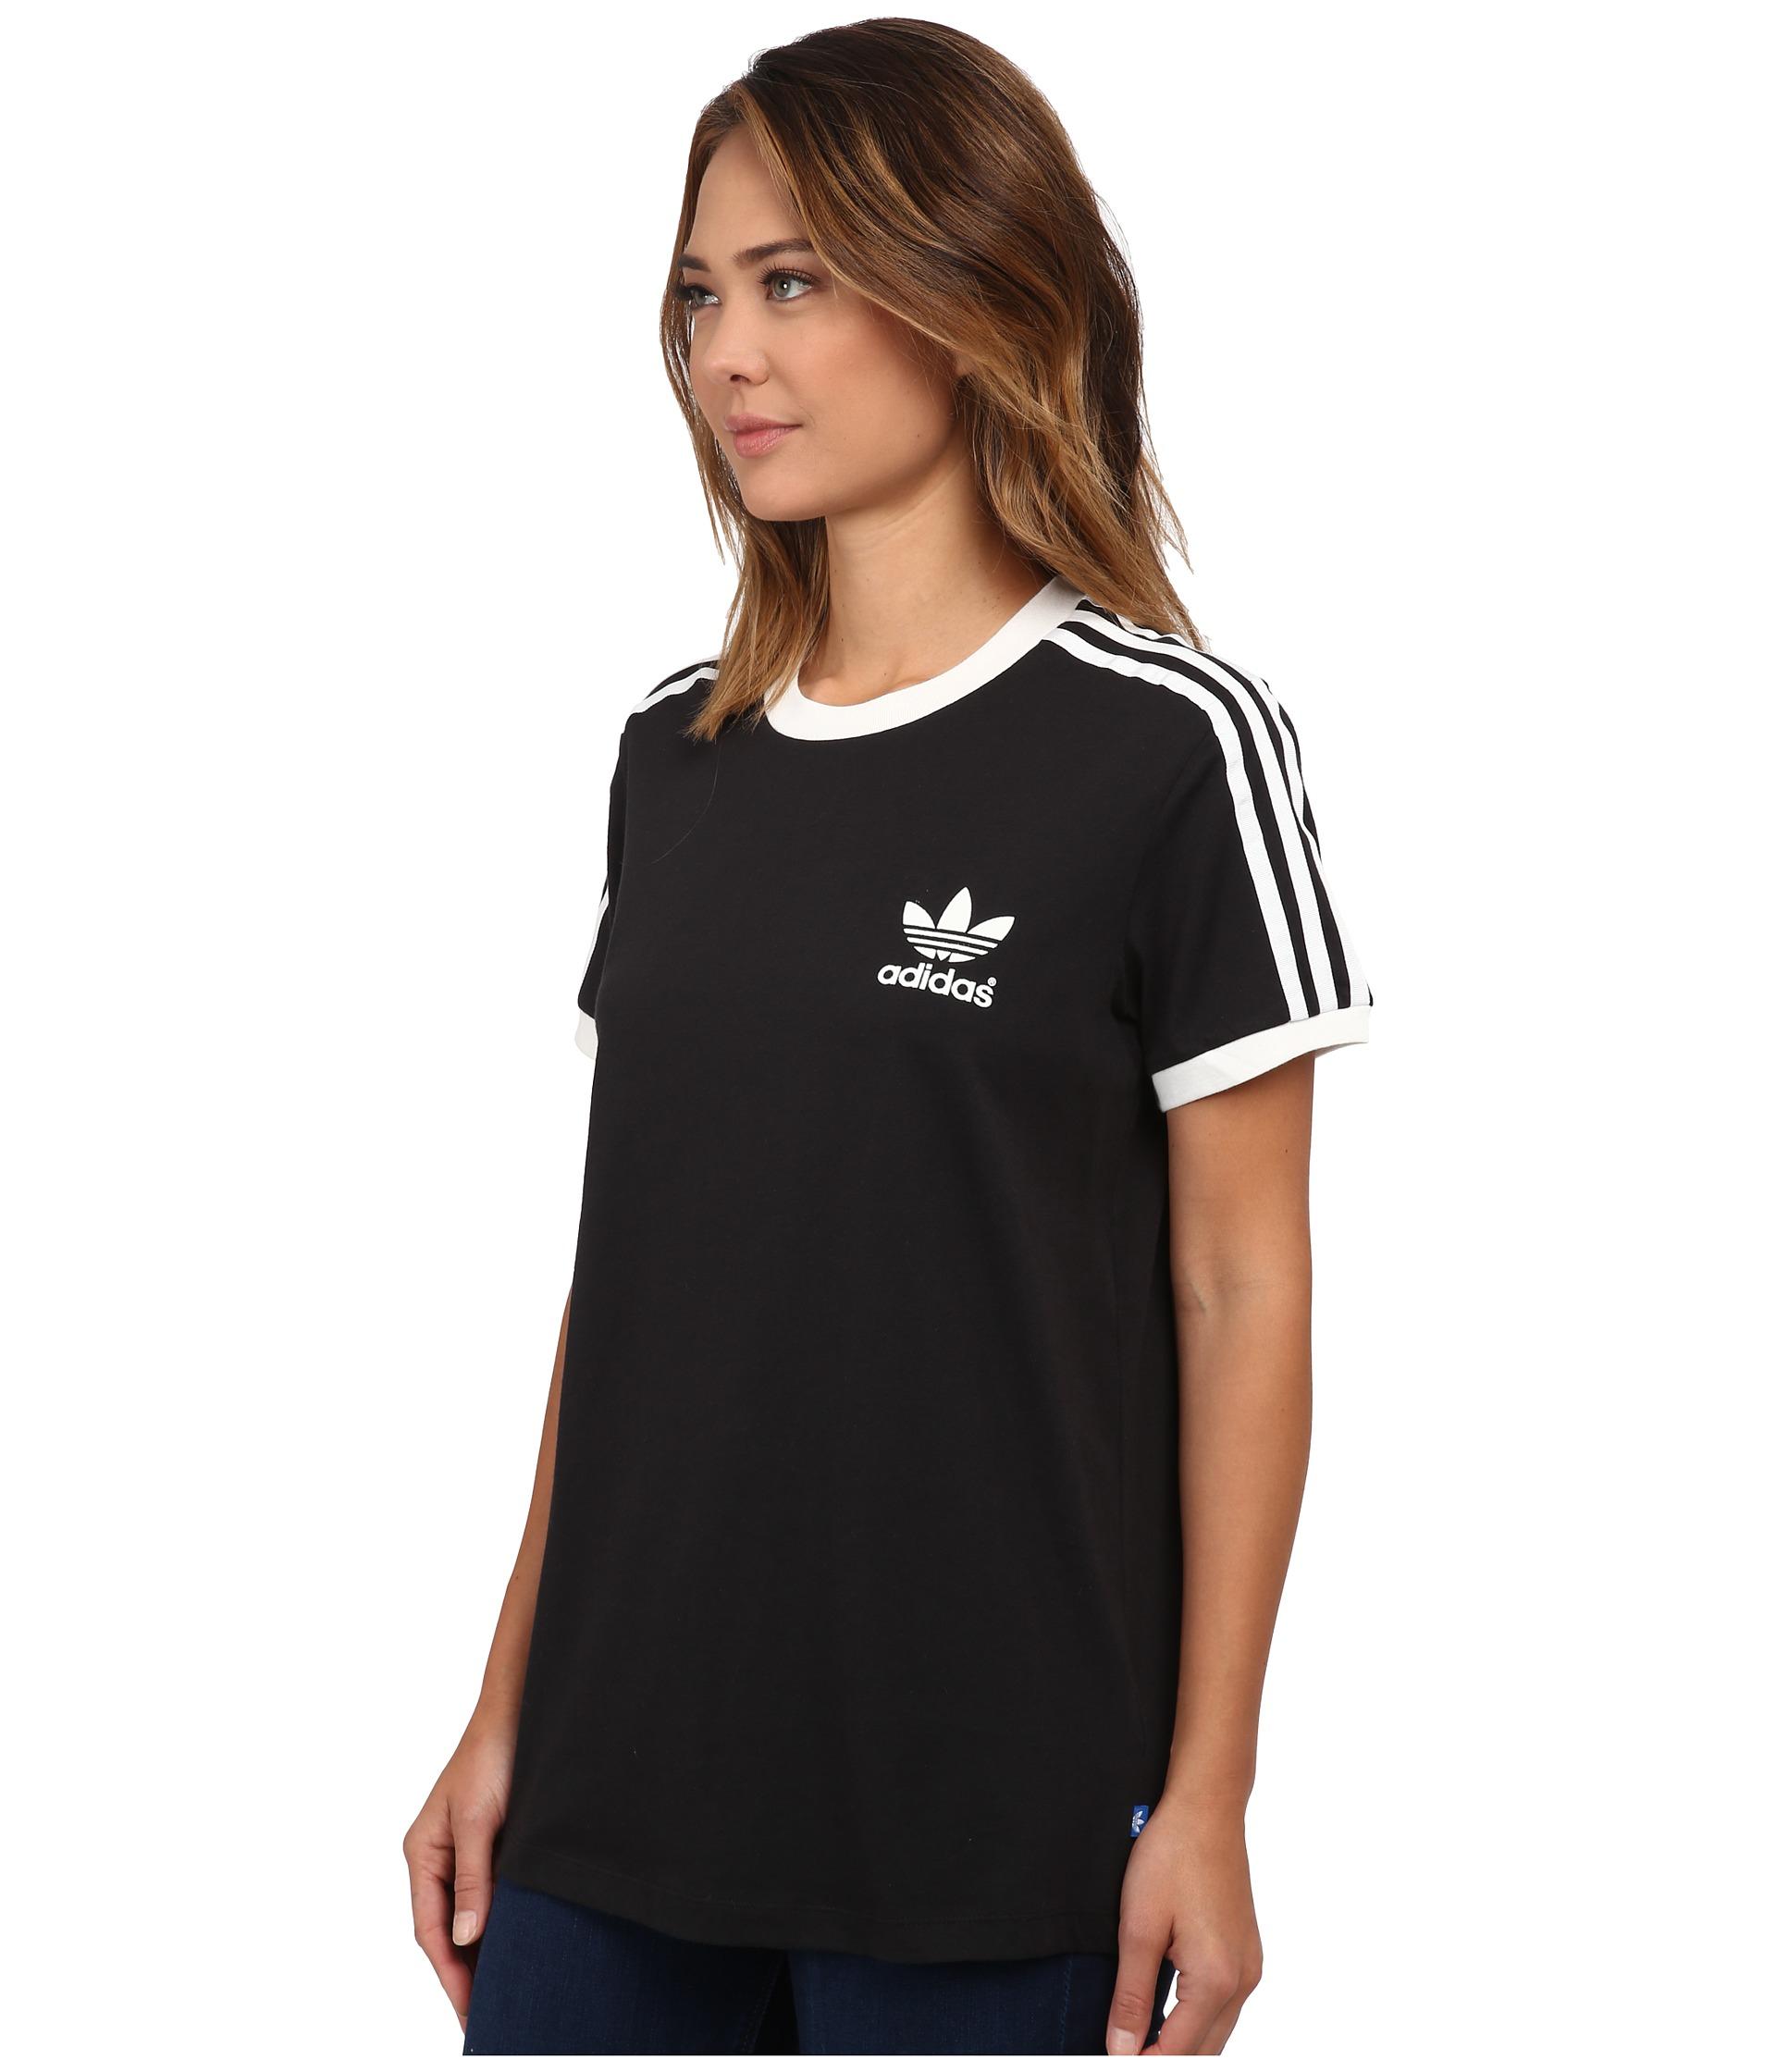 0246da6159 adidas Originals 3-stripes Tee in Black - Lyst